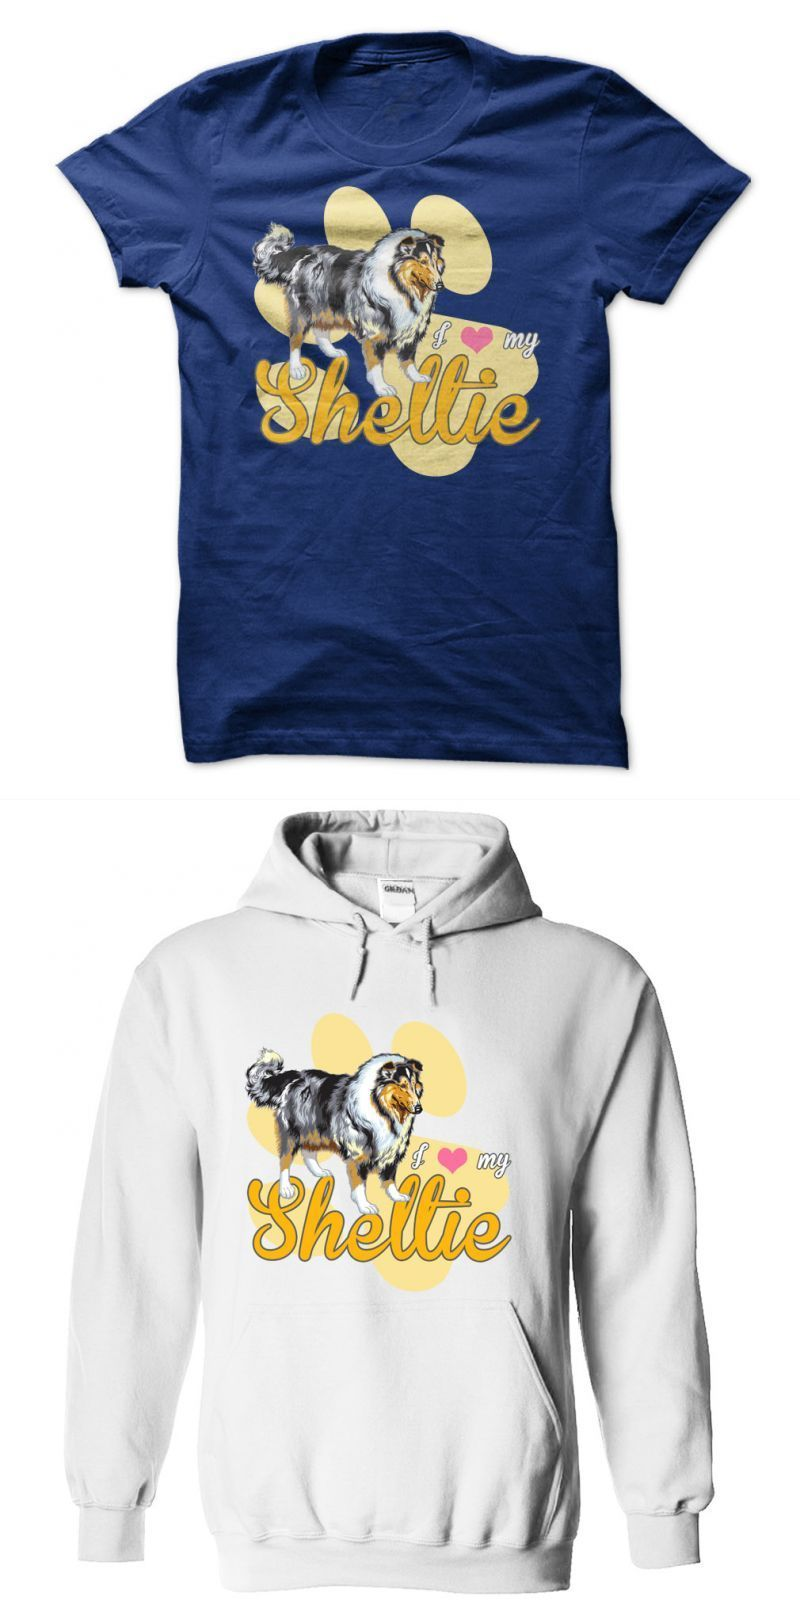 c1673c311a00 I Love My Sheltie! For Shetland Sheepdog Lovers! Dog T Shirt Diy #snoop  #dogg #t #shirt #uk #t #shirt #with #dog #logo #yellow #dog #t #shirt #your  #dog #on ...